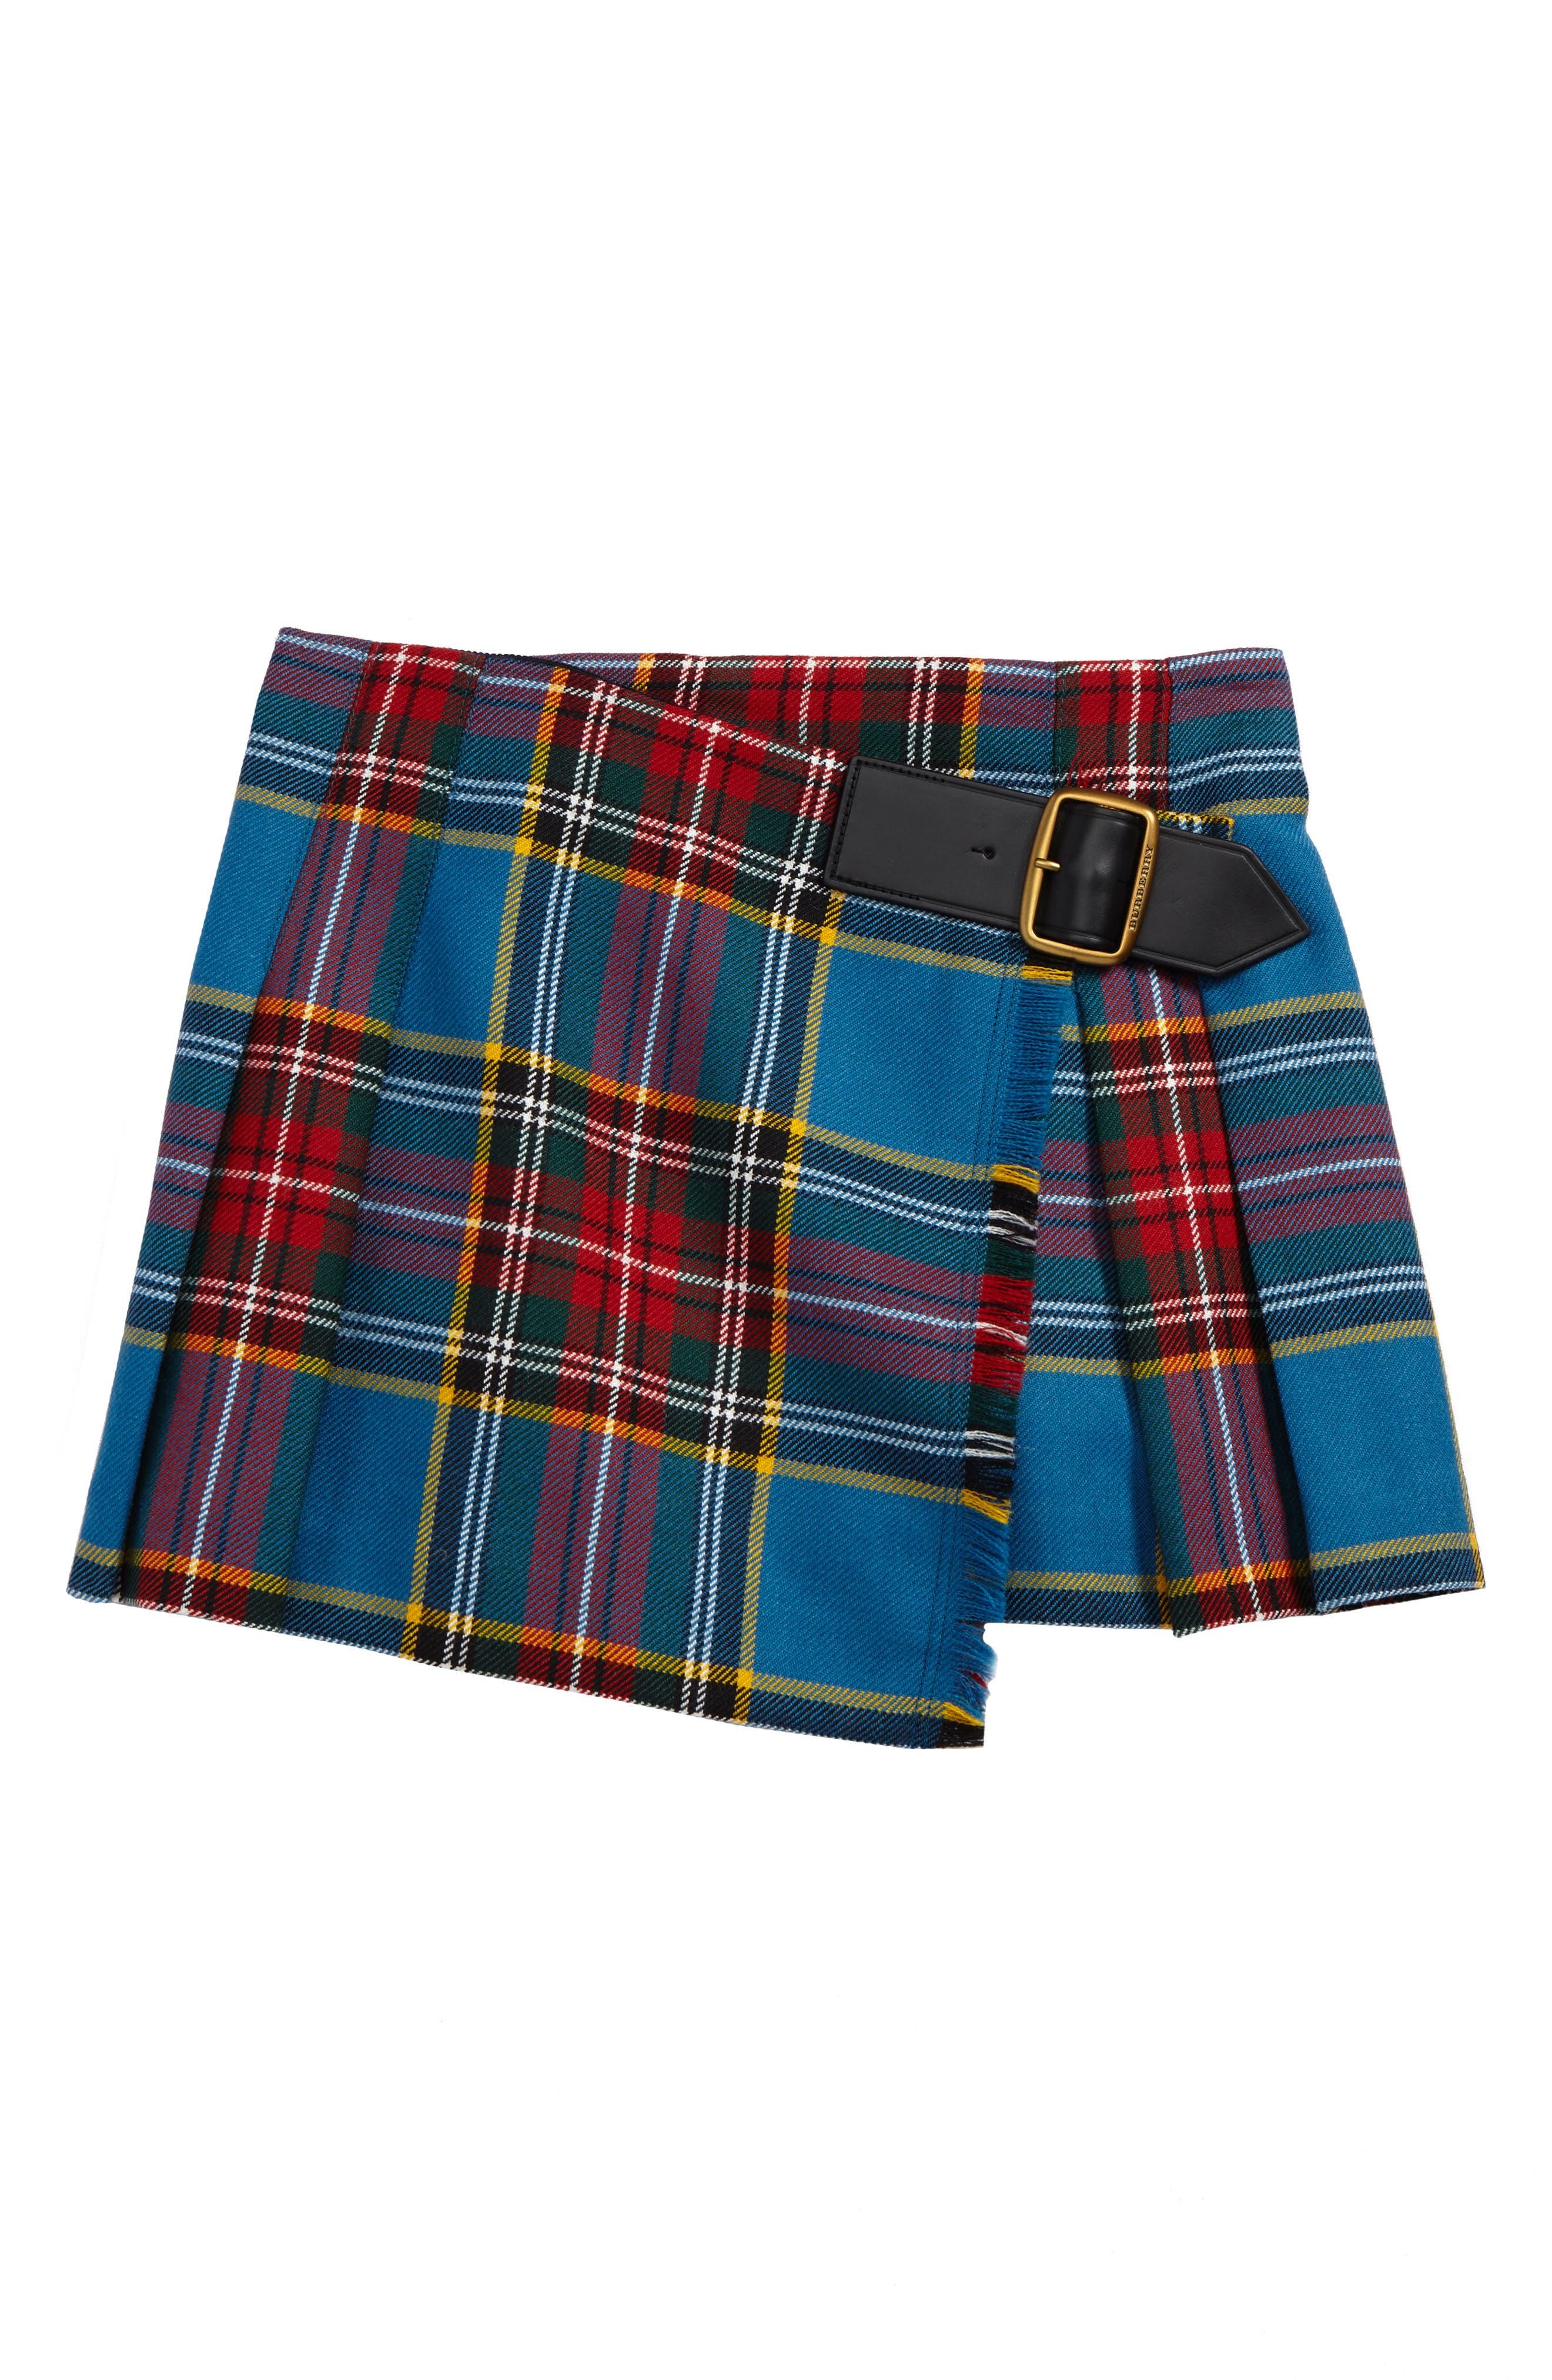 Alternate Image 1 Selected - Burberry Klorrie Plaid Wool Miniskirt (Little Girls & Big Girls)